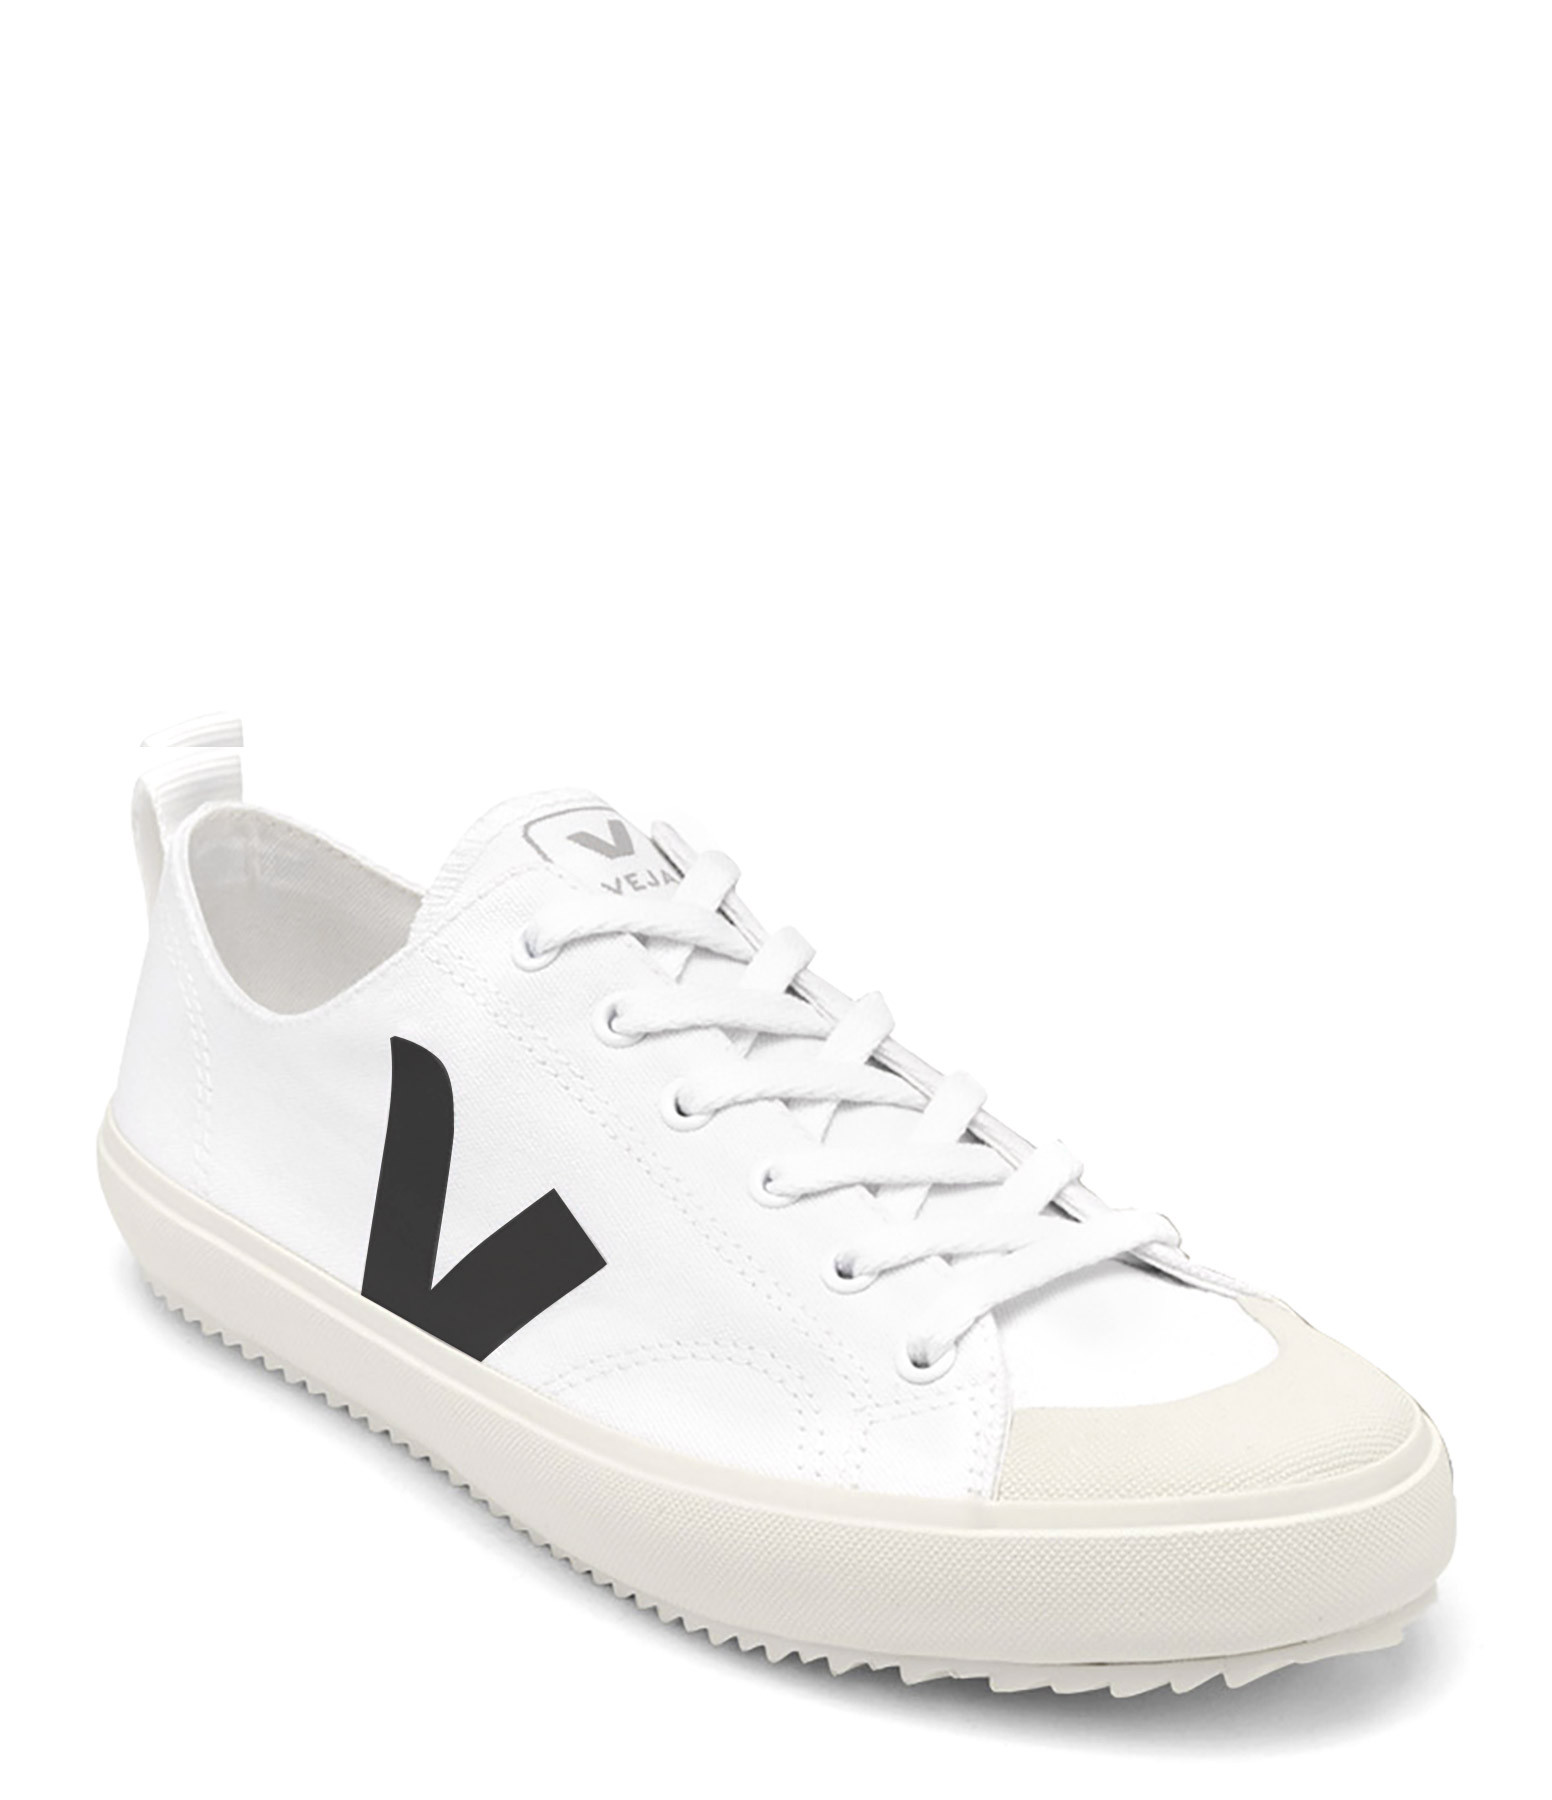 VEJA - Baskets Nova Canvas Blanc Noir